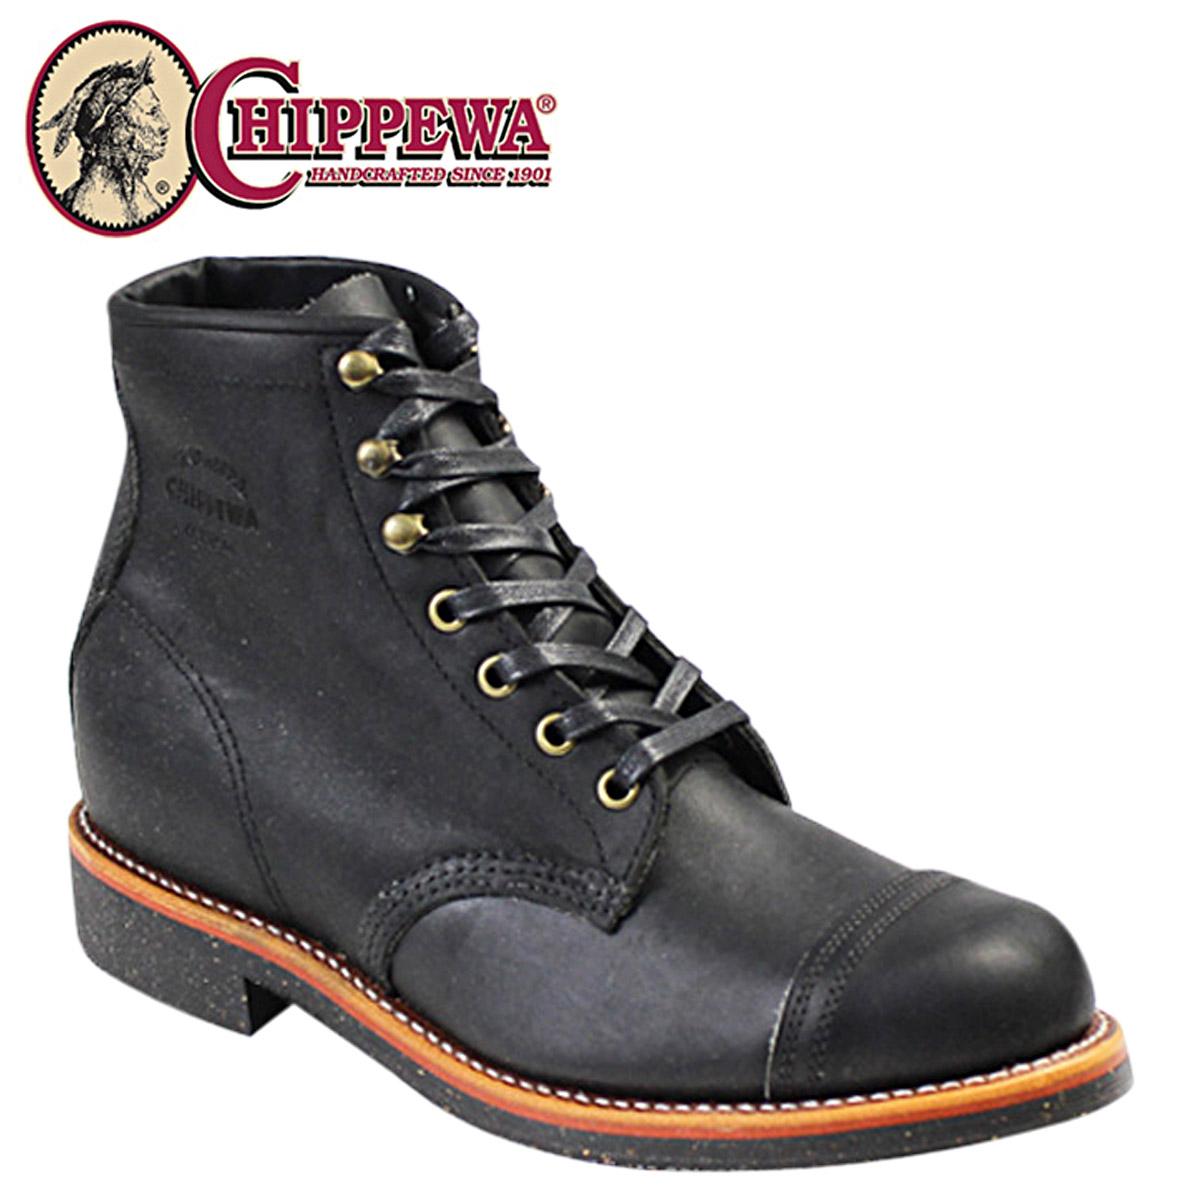 CHIPPEWA チペワ 6インチ ホームステッド ブーツ ブラック 1901M31 6INCH HOMESTEAD BOOT Dワイズ レザー メンズ